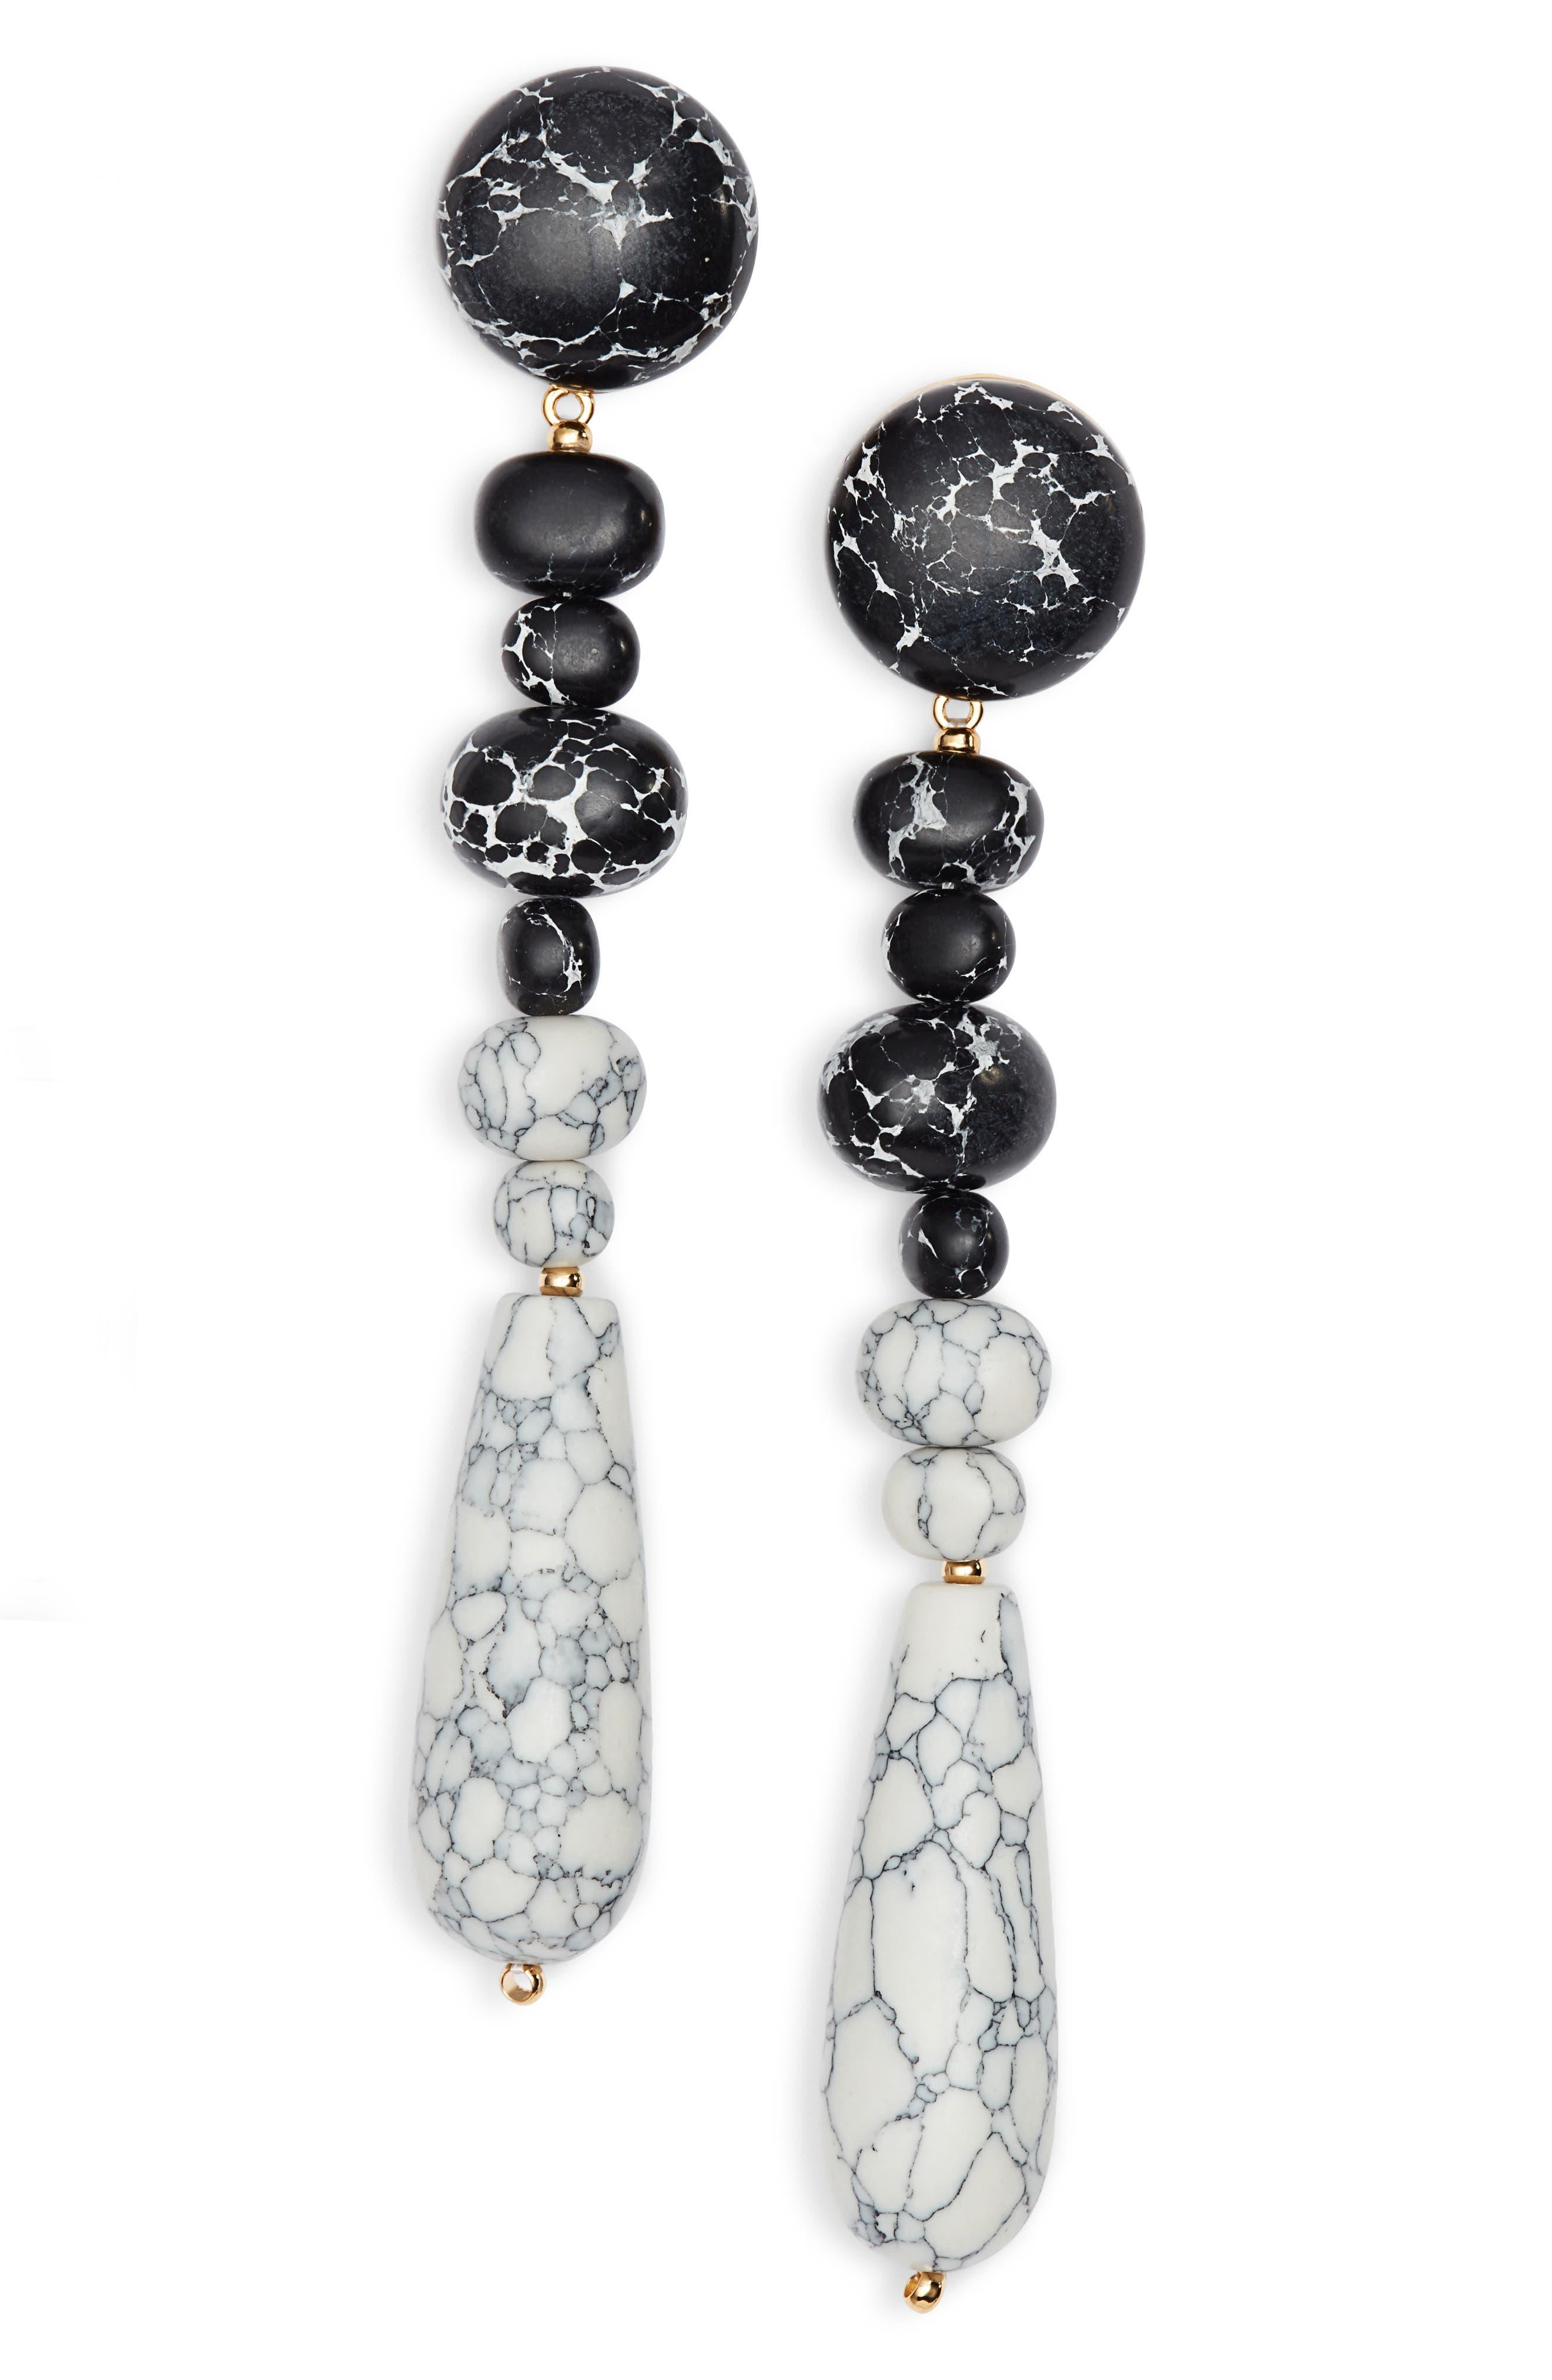 Copacabana Drop Earrings,                             Main thumbnail 1, color,                             Black And White